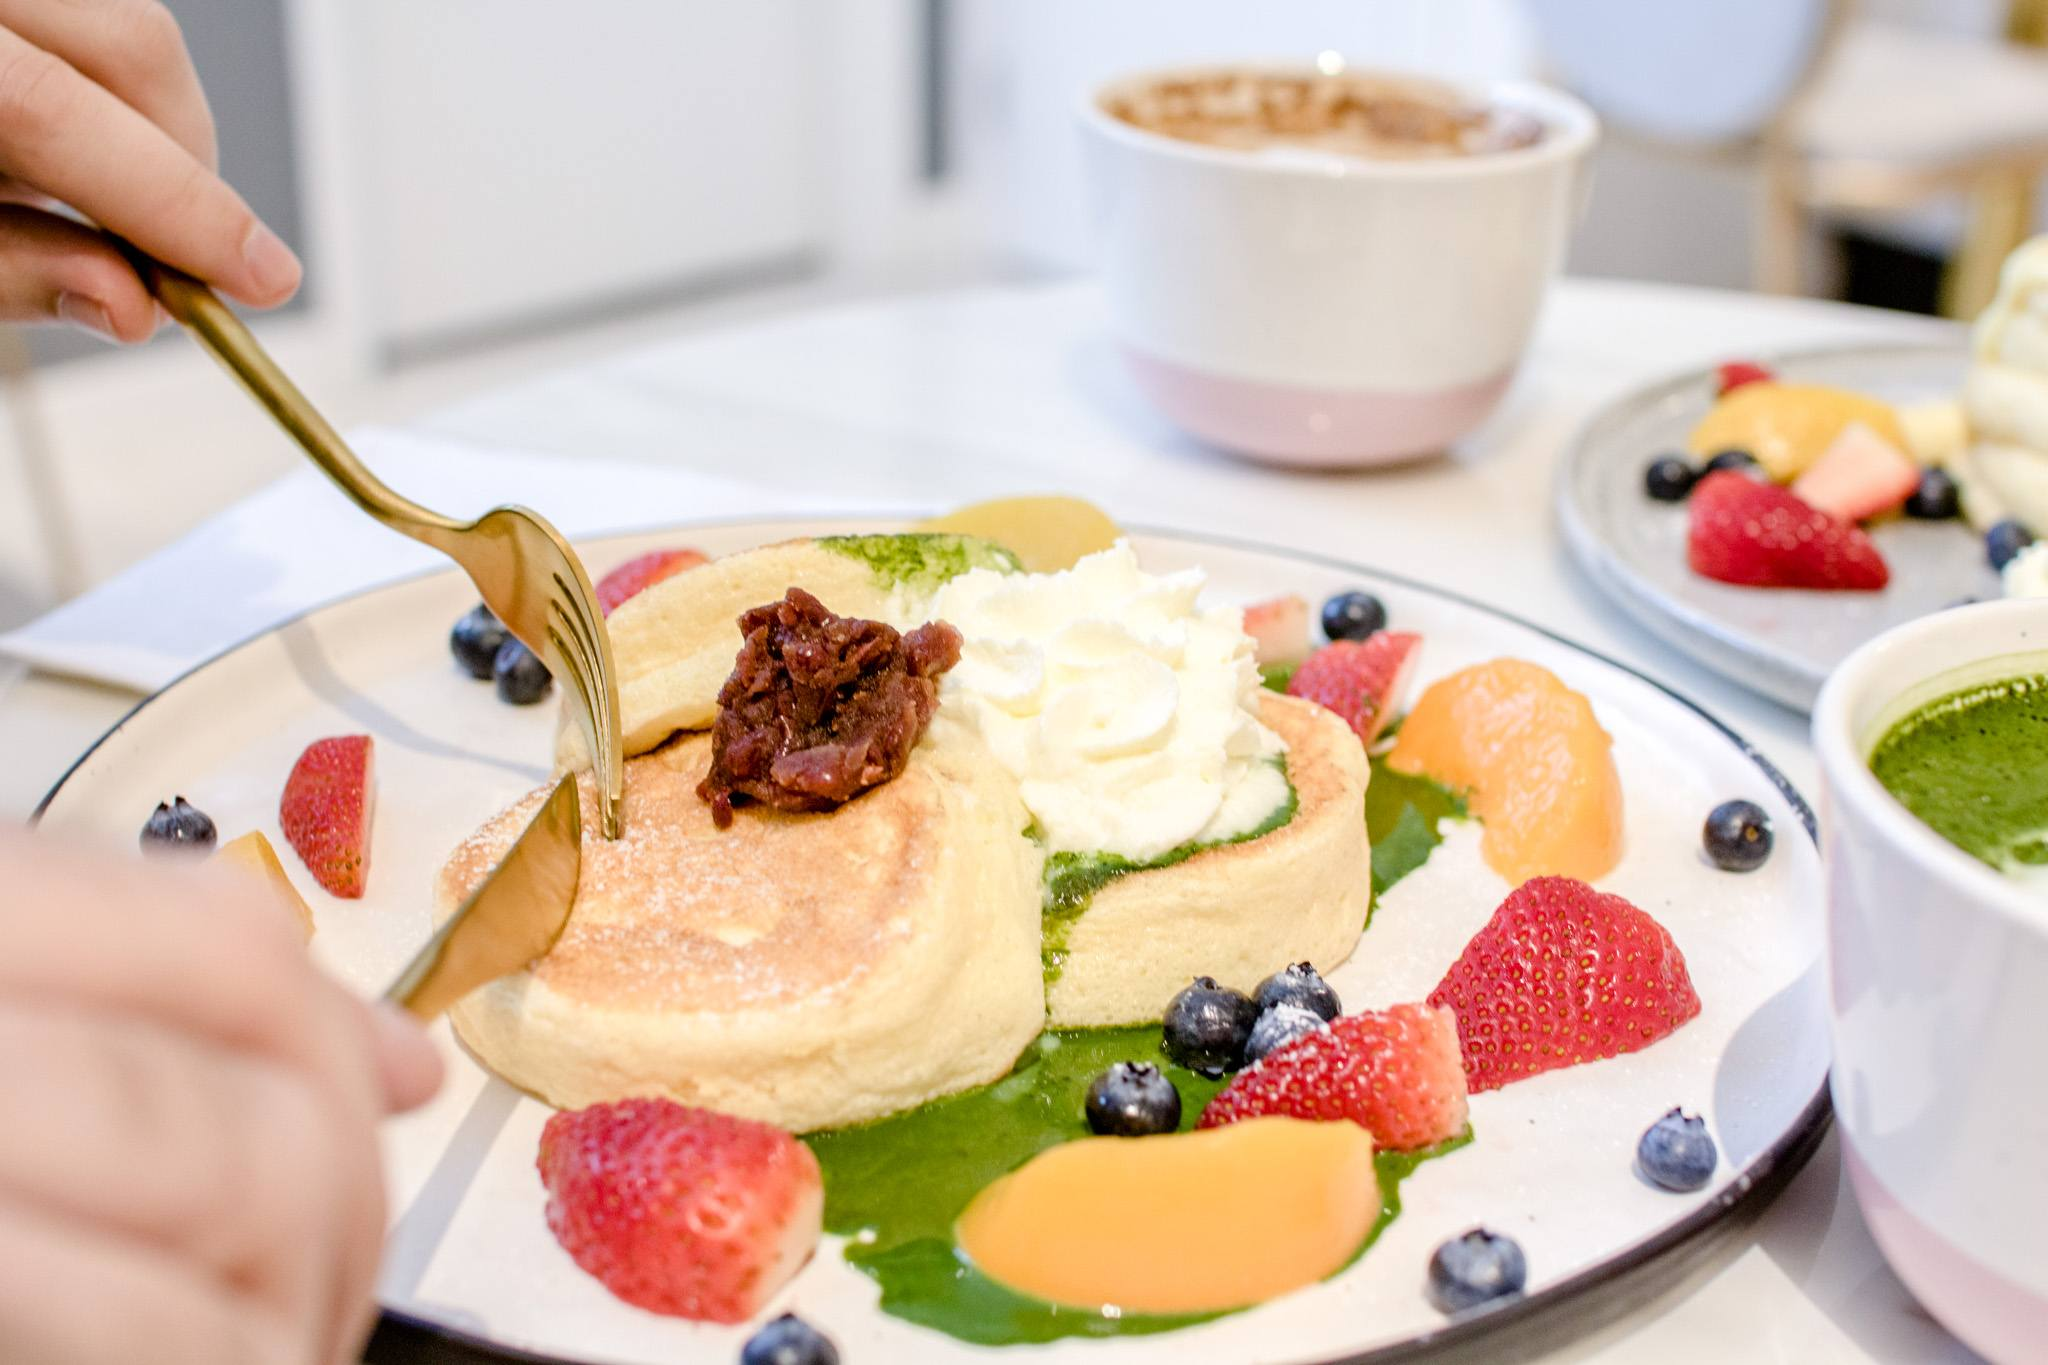 hanabusa cafe japanese souffle pancakes toronto